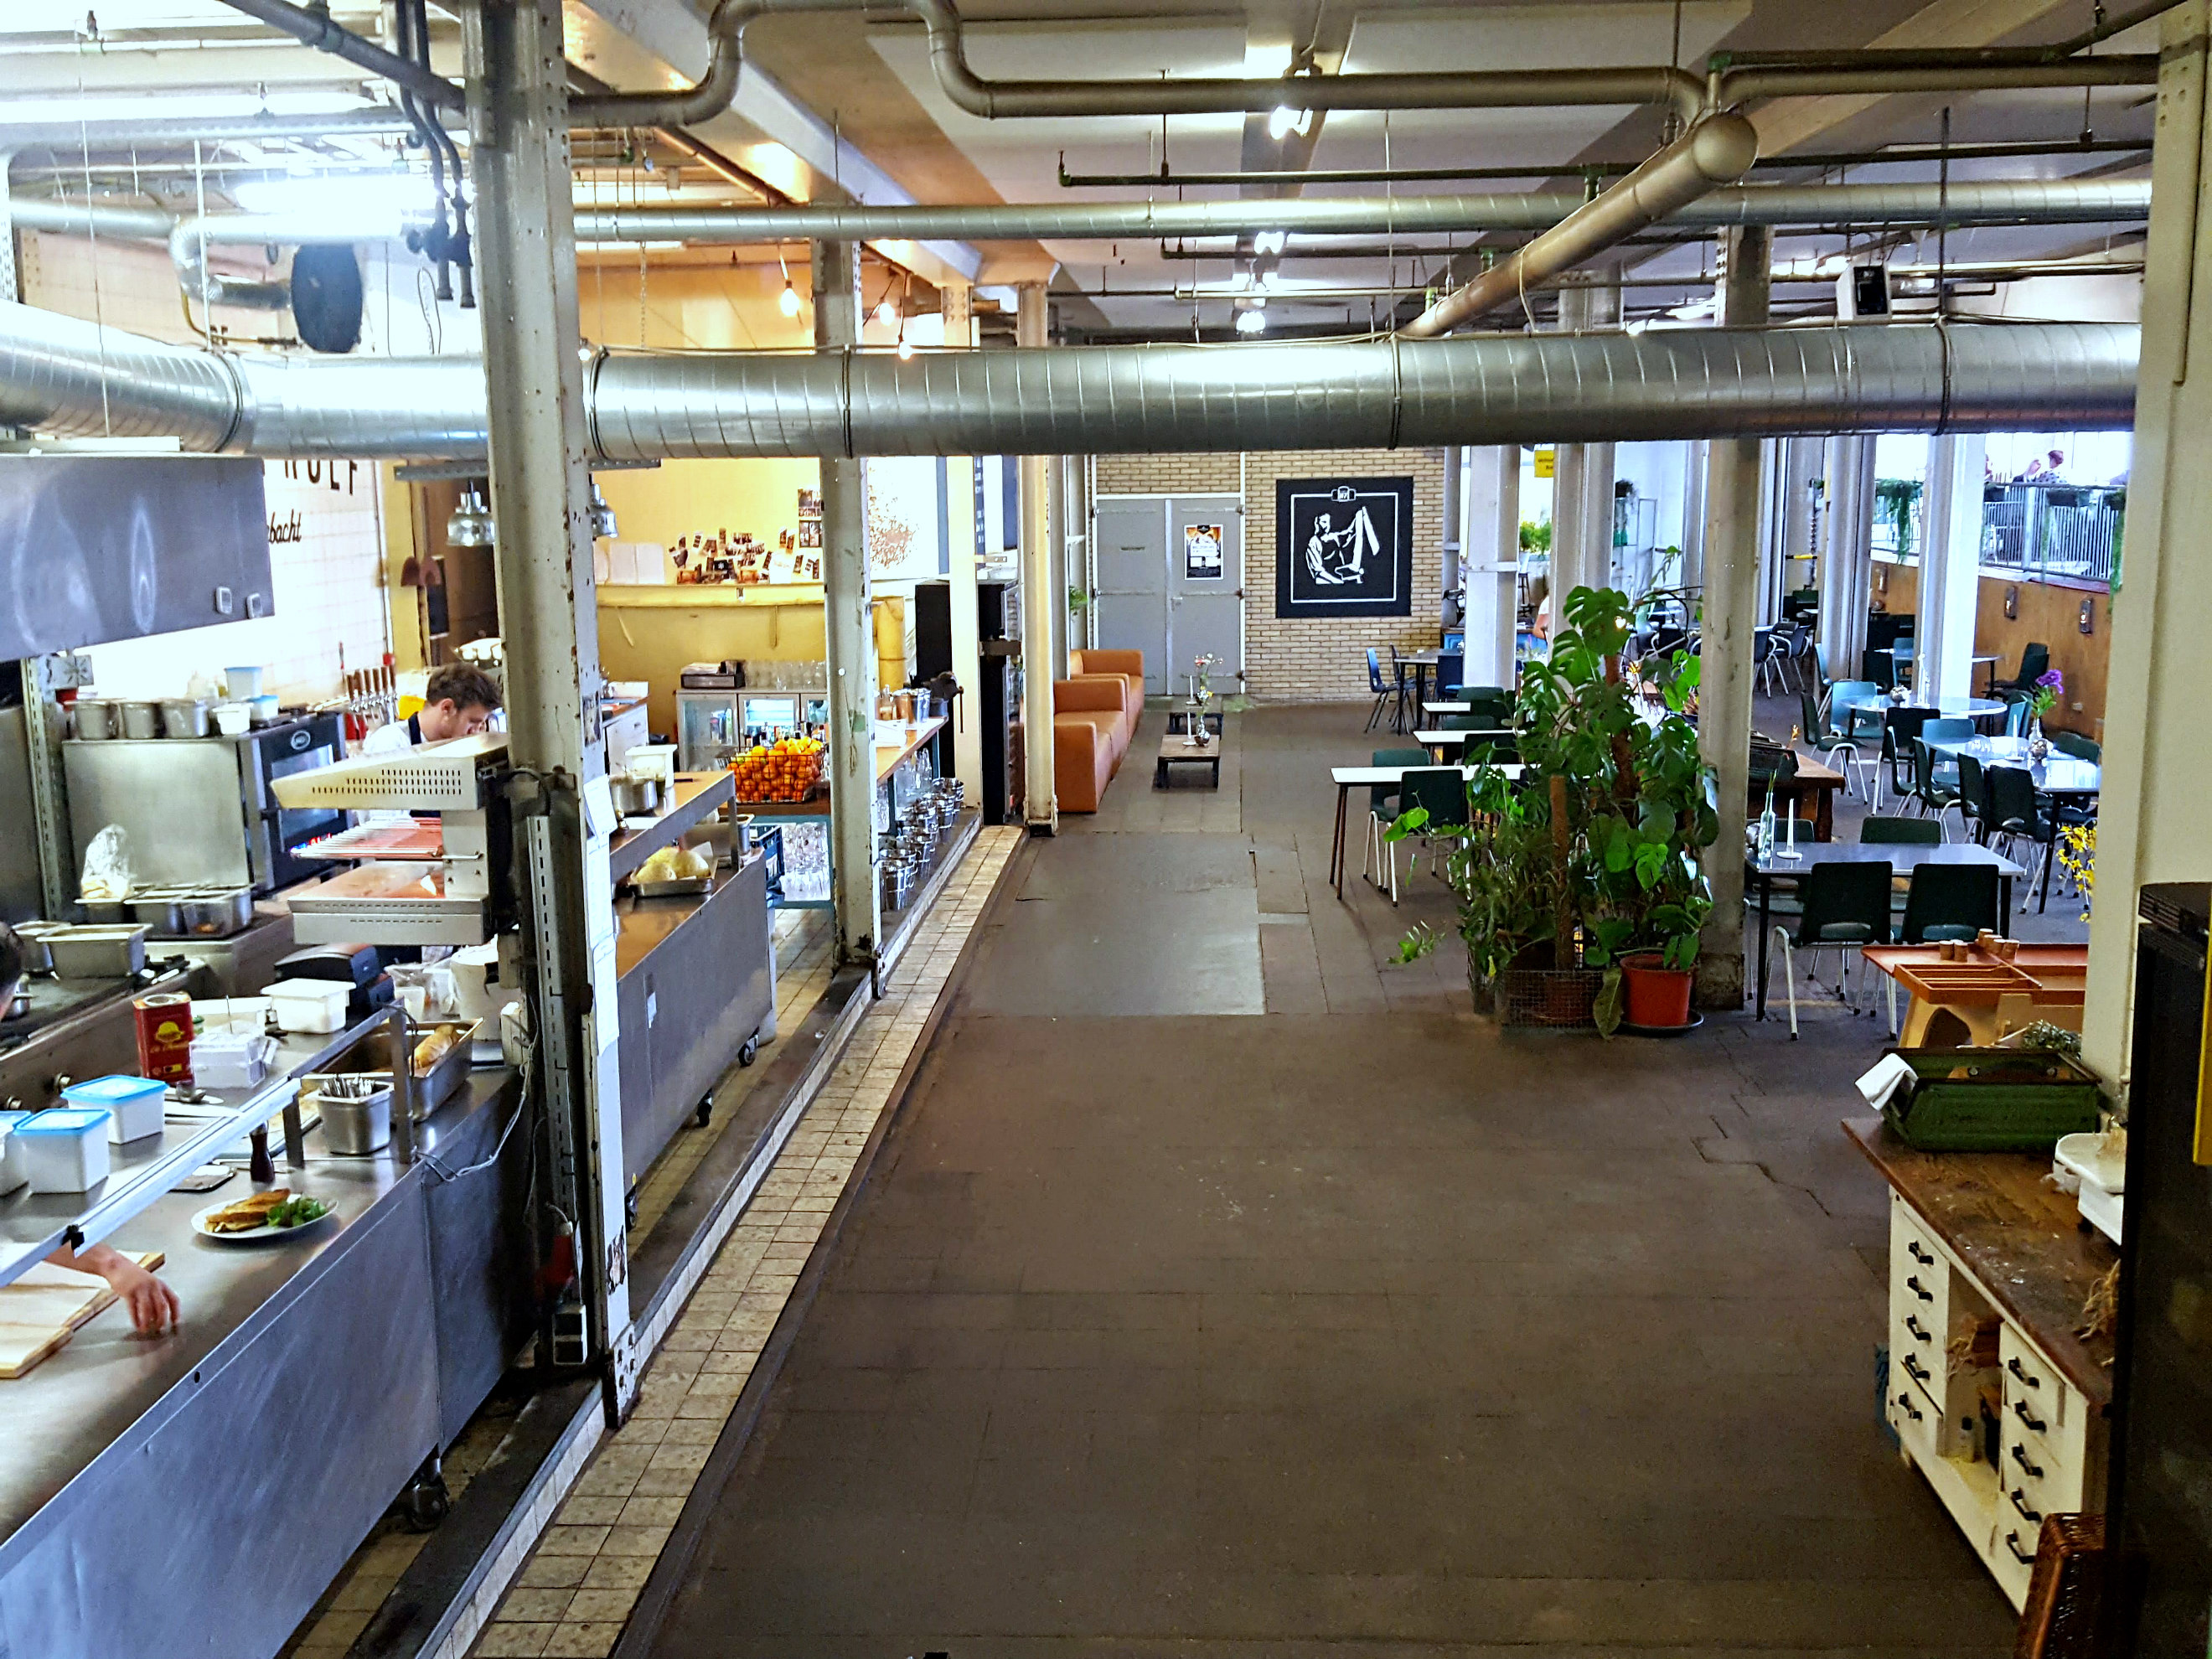 Keuken Outlet Store : Lunchen bij meesterproef hotspot nijmegen open keuken all lovely